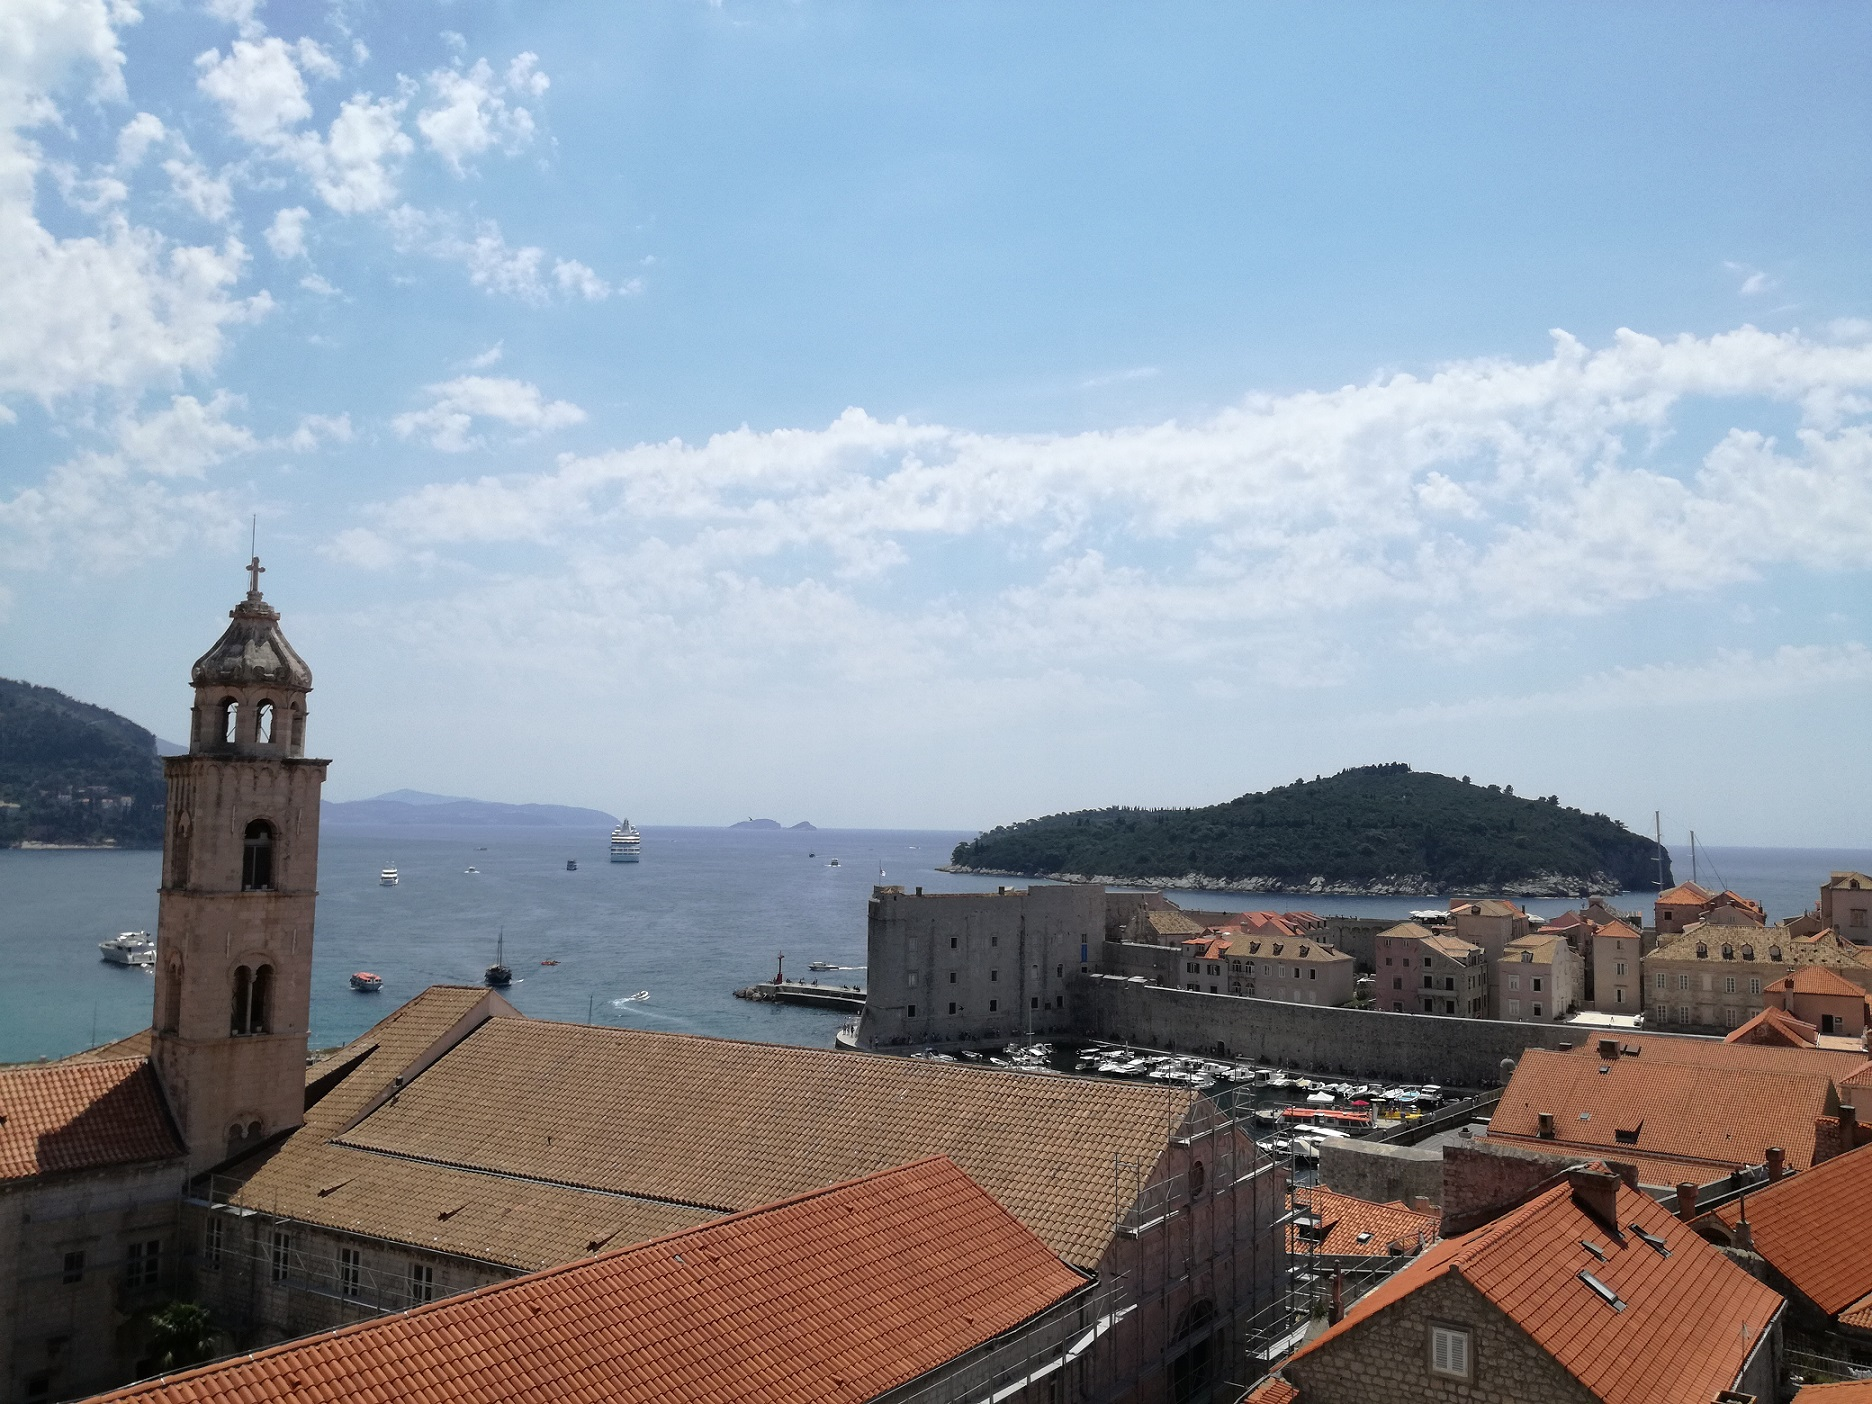 Dubrovnik IMG 20180712 115538 Please Credit Rachel McFaul 4